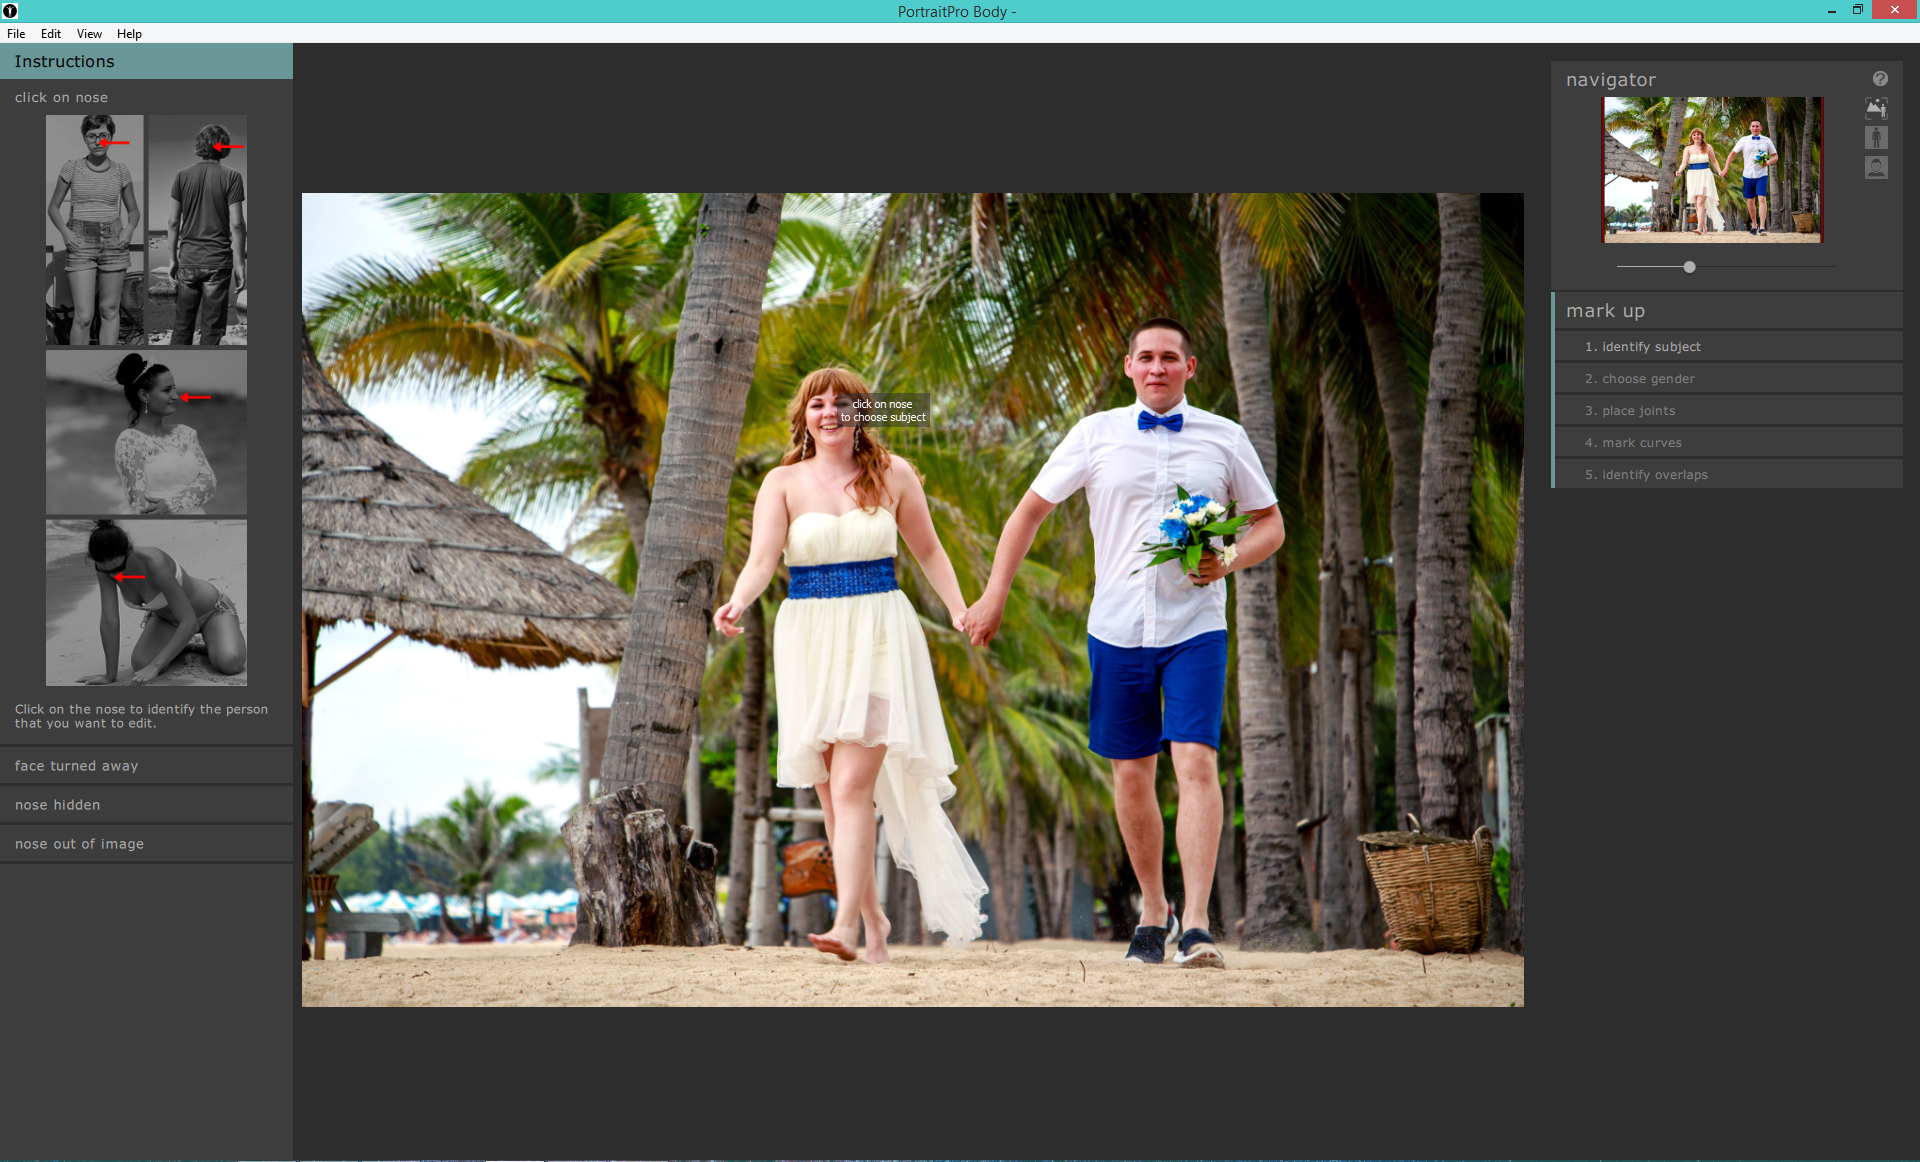 PortraitPro Body | PortraitPro Blog